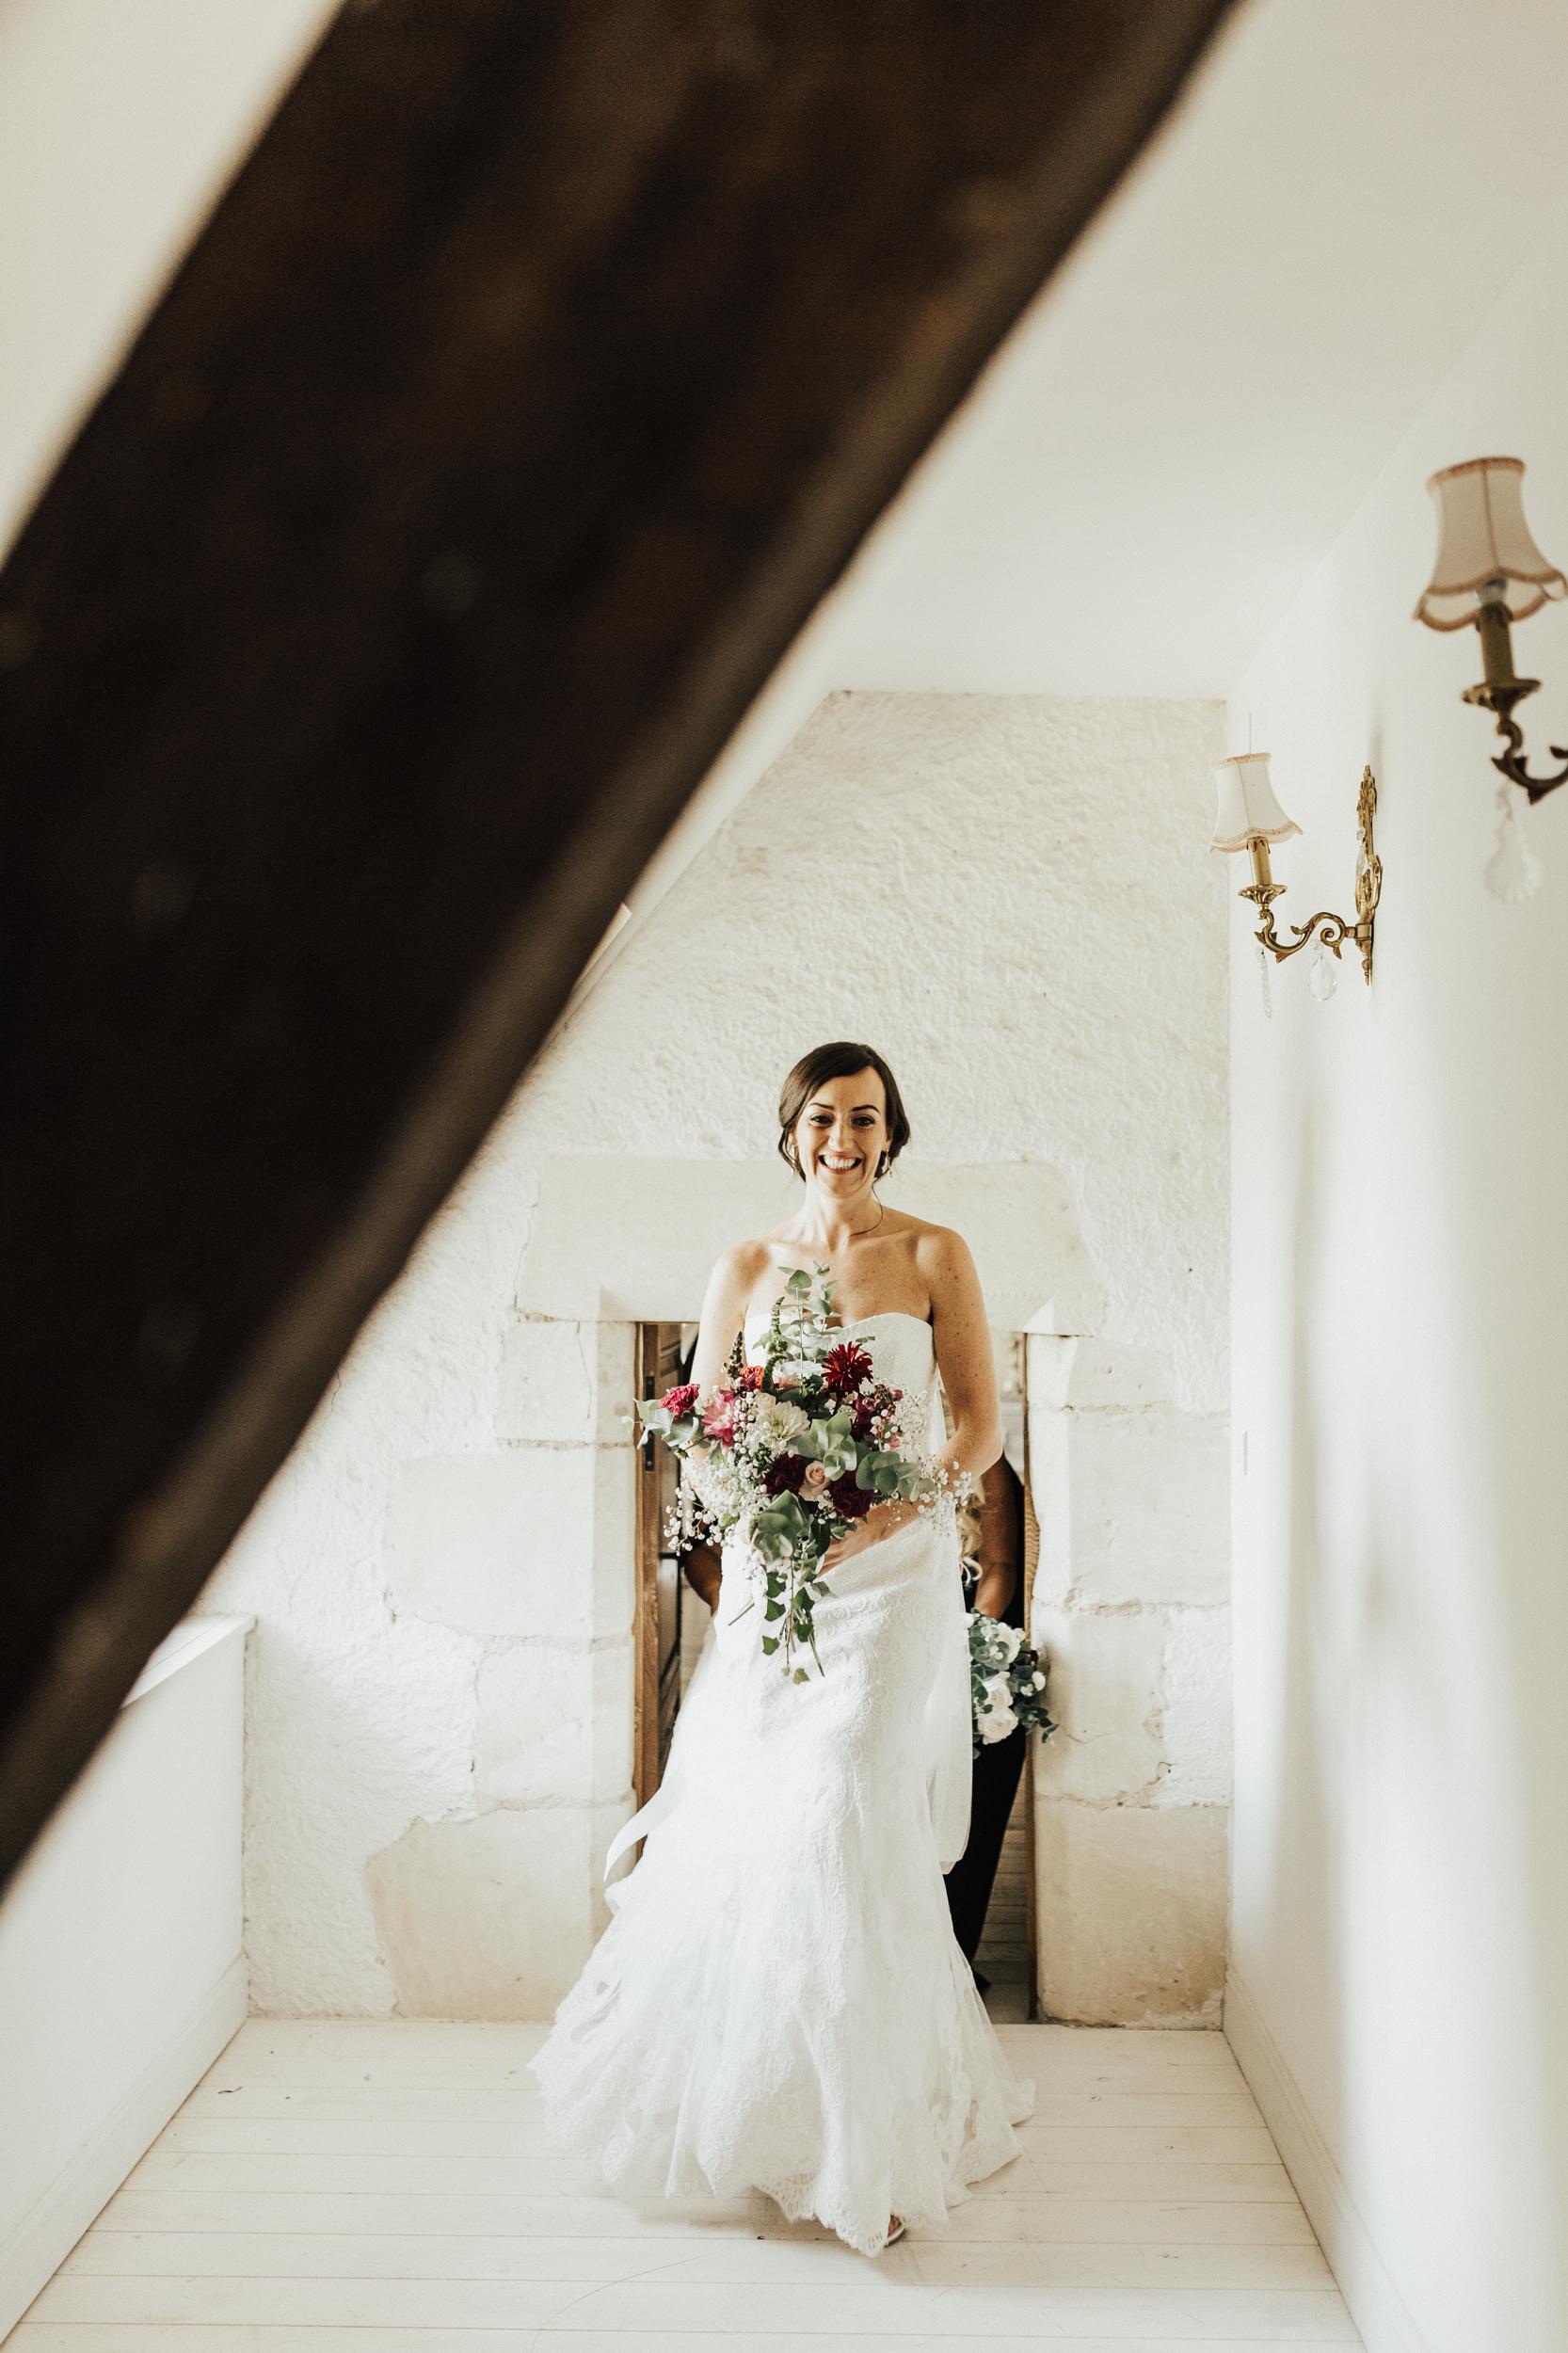 Amy-Zac-Destination-Wedding-France-Manoir-Foulquetiere-Darina-Stoda-Photography-33.jpg